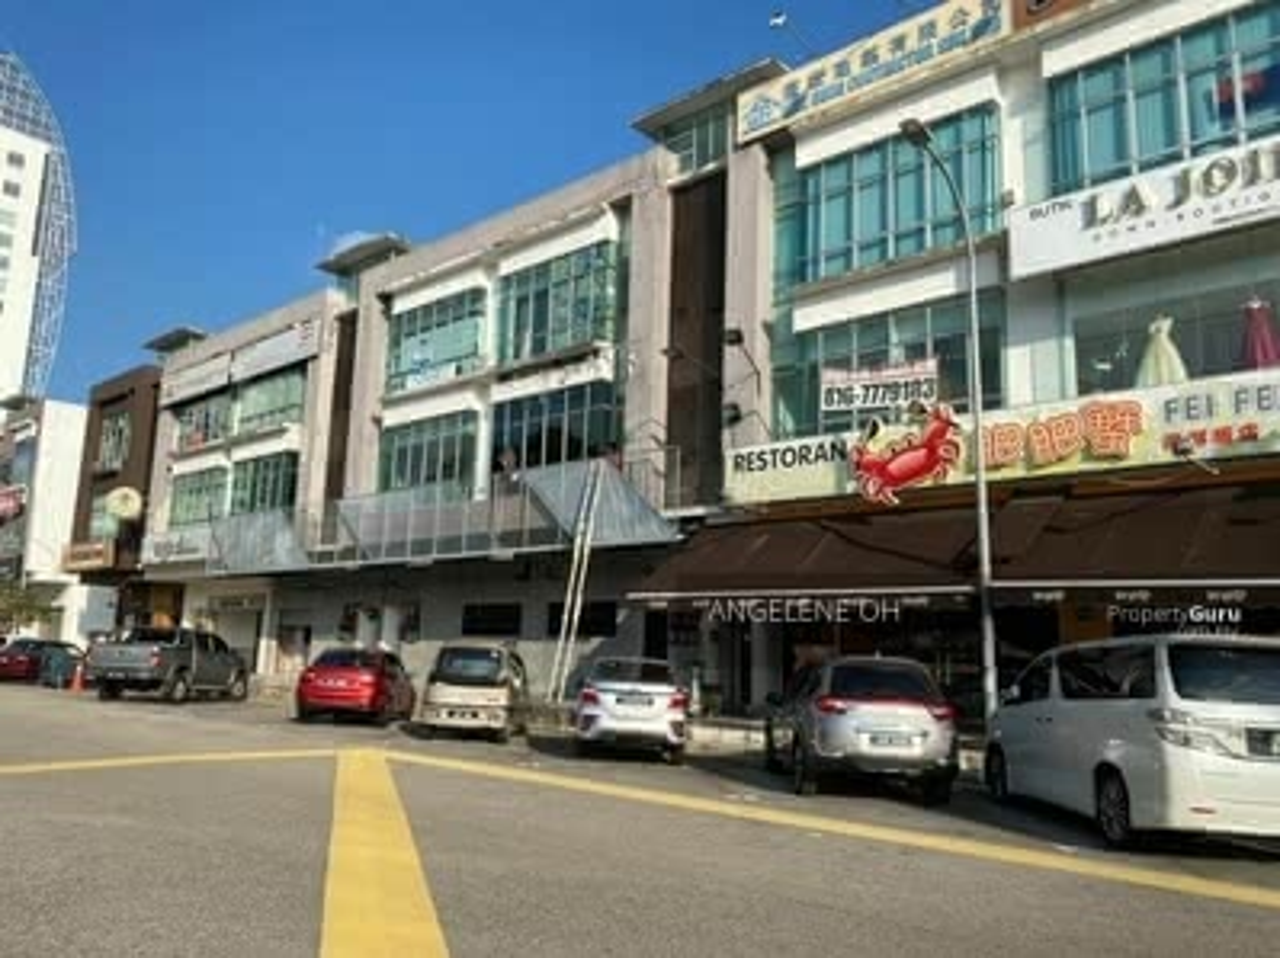 For Rent - Taman Austin Heights, Austin Height, Johor Bahru